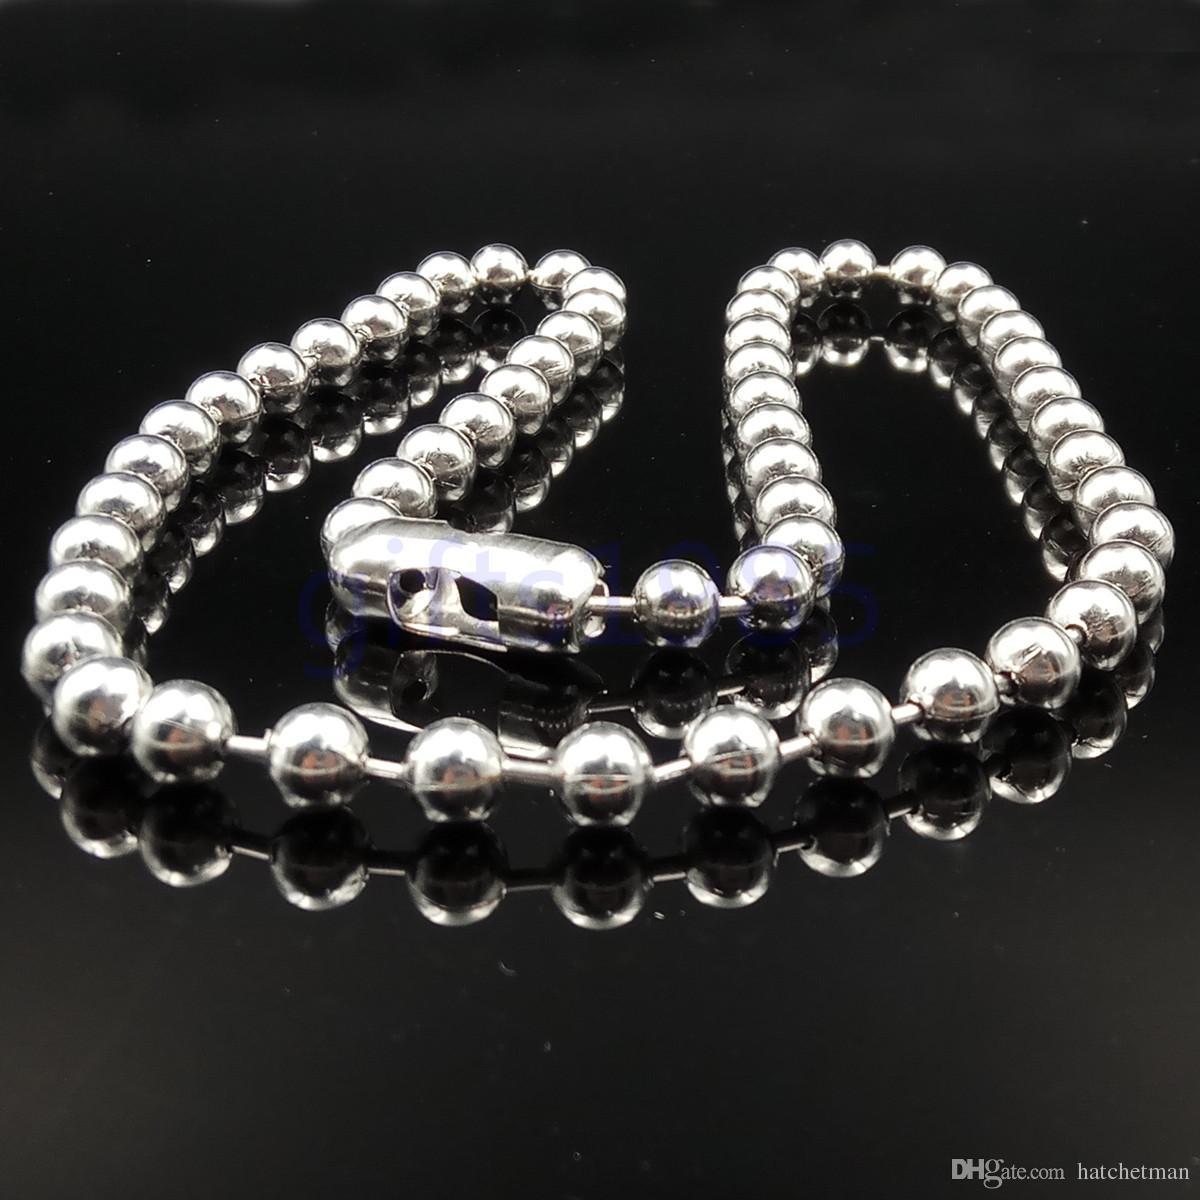 Corrente dos homens 6mm de aço inoxidável grande bola 26in colar e 9in conjunto de pulseira